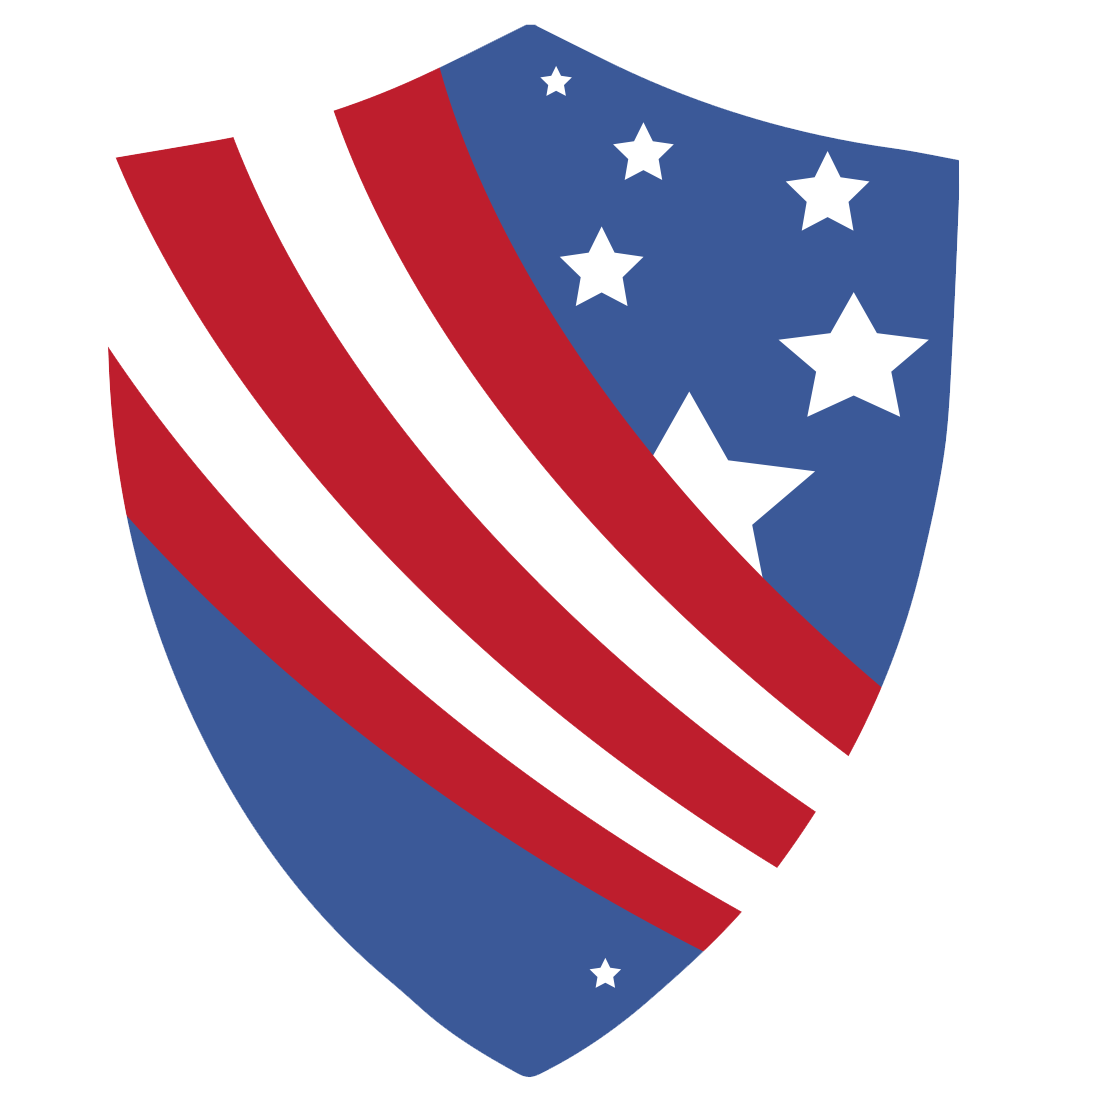 vector transparent stock Usa transparent shield. Tea party patriots action